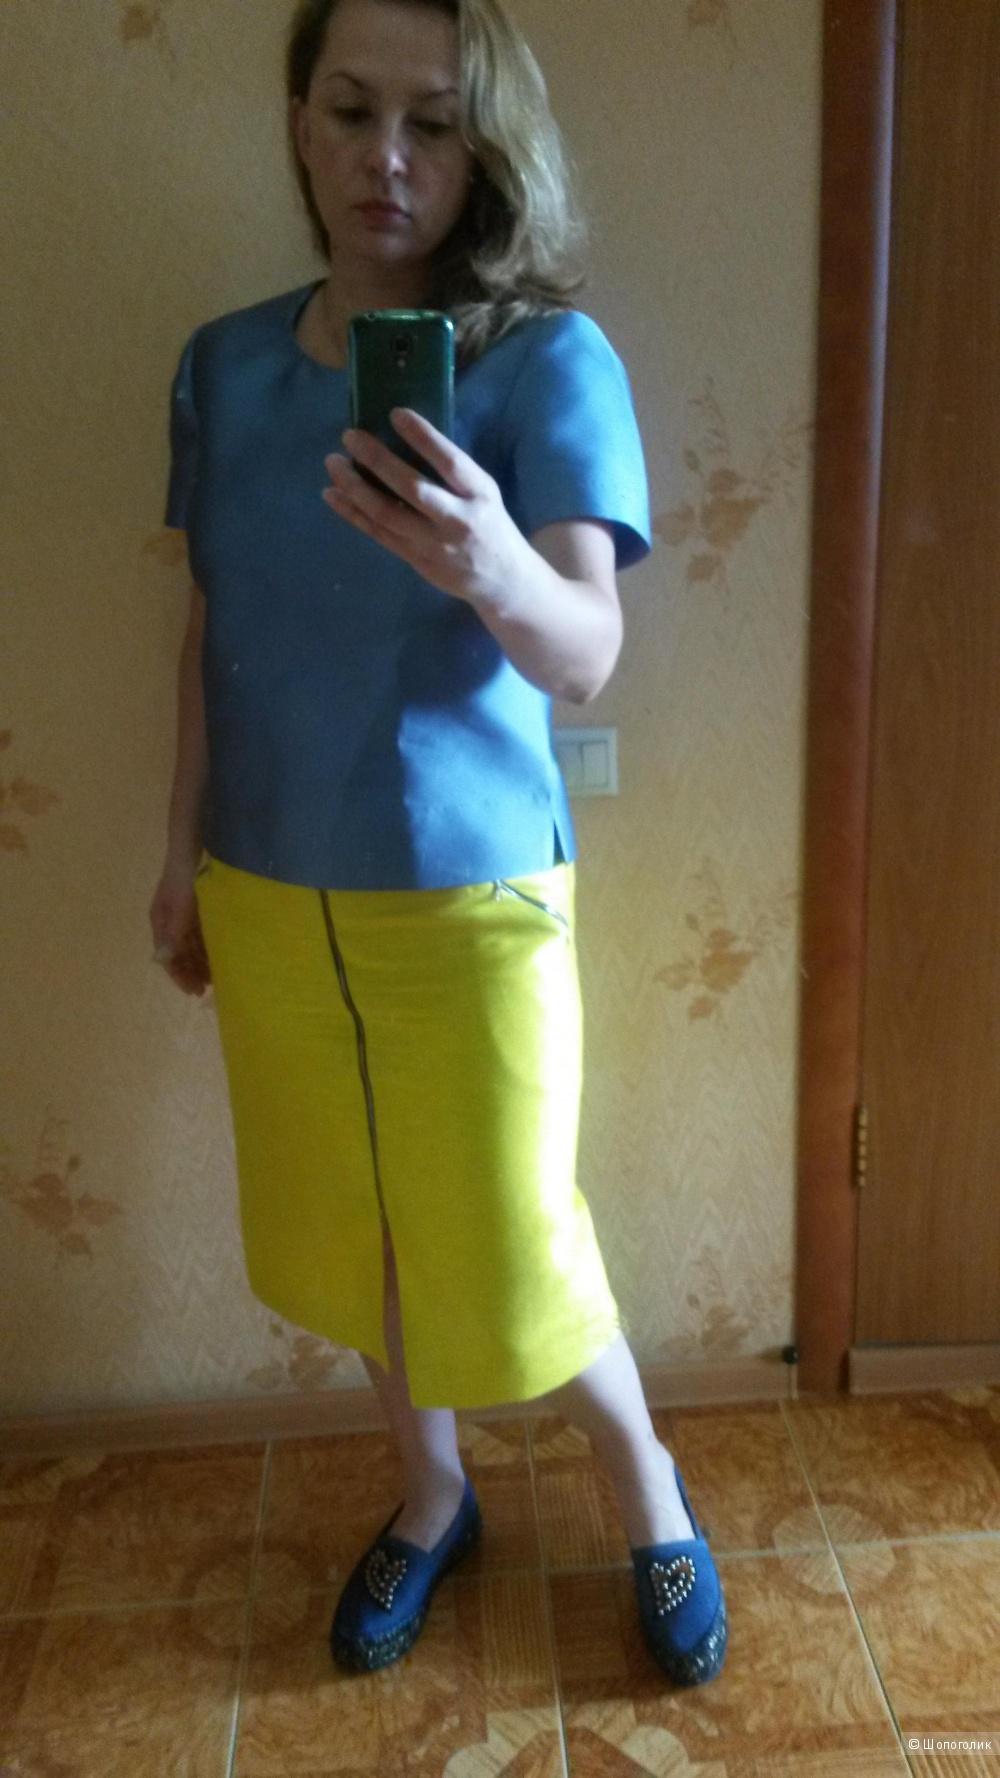 MARC BY MARC JACOBS Джинсовые брюки, р-р 28